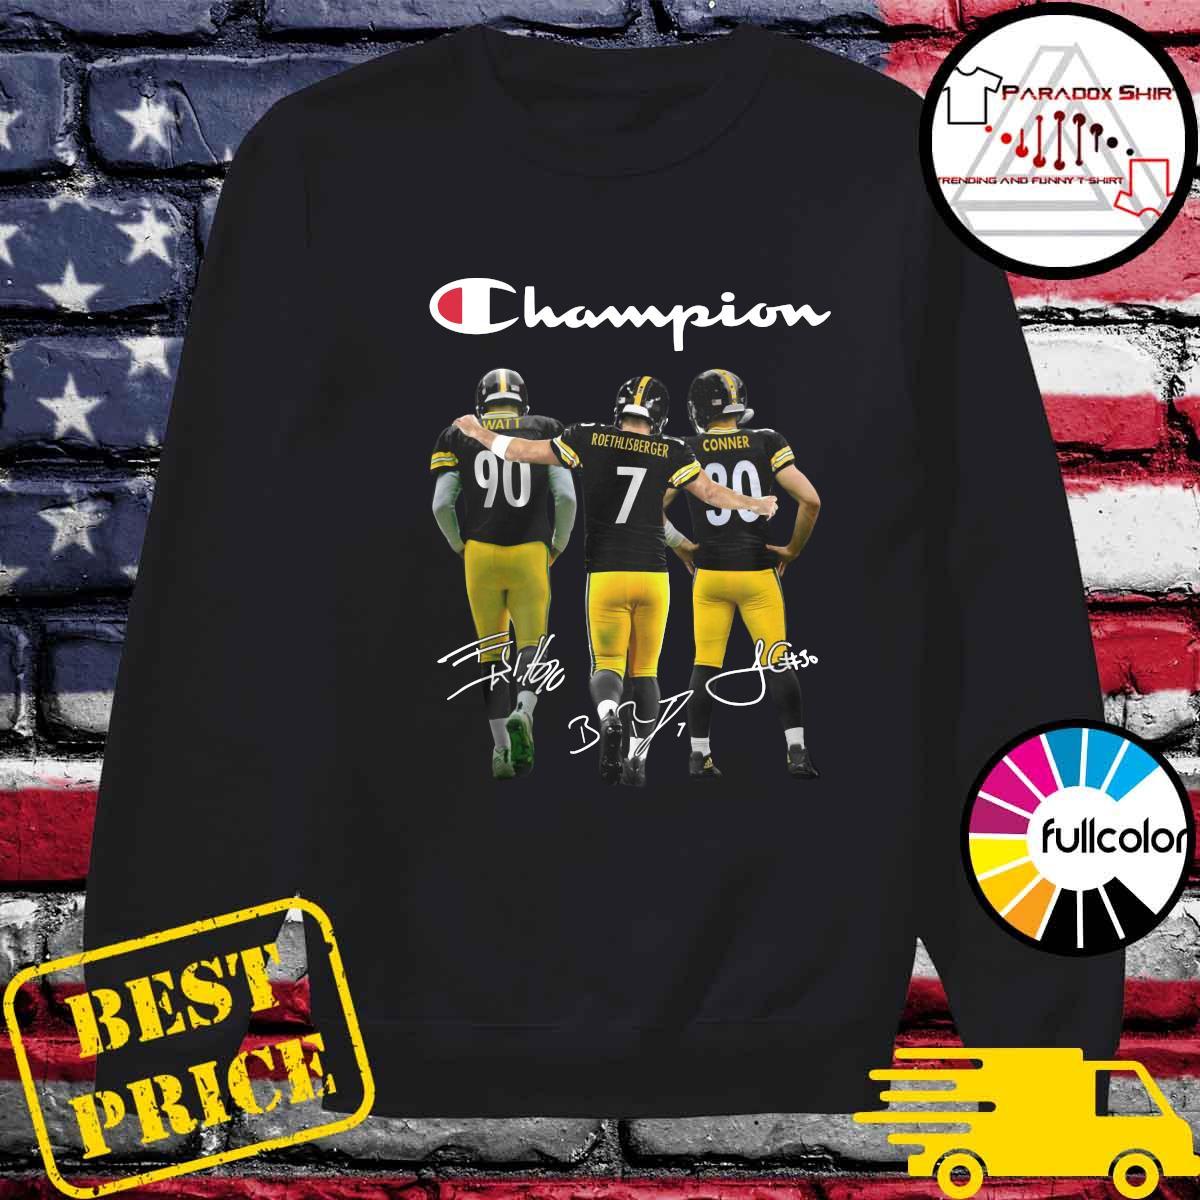 Champions Pittsburgh Steelers T J Watt 90 Ben Roethlisberger 7 James Conner 30 Signatures Shirt Sweater